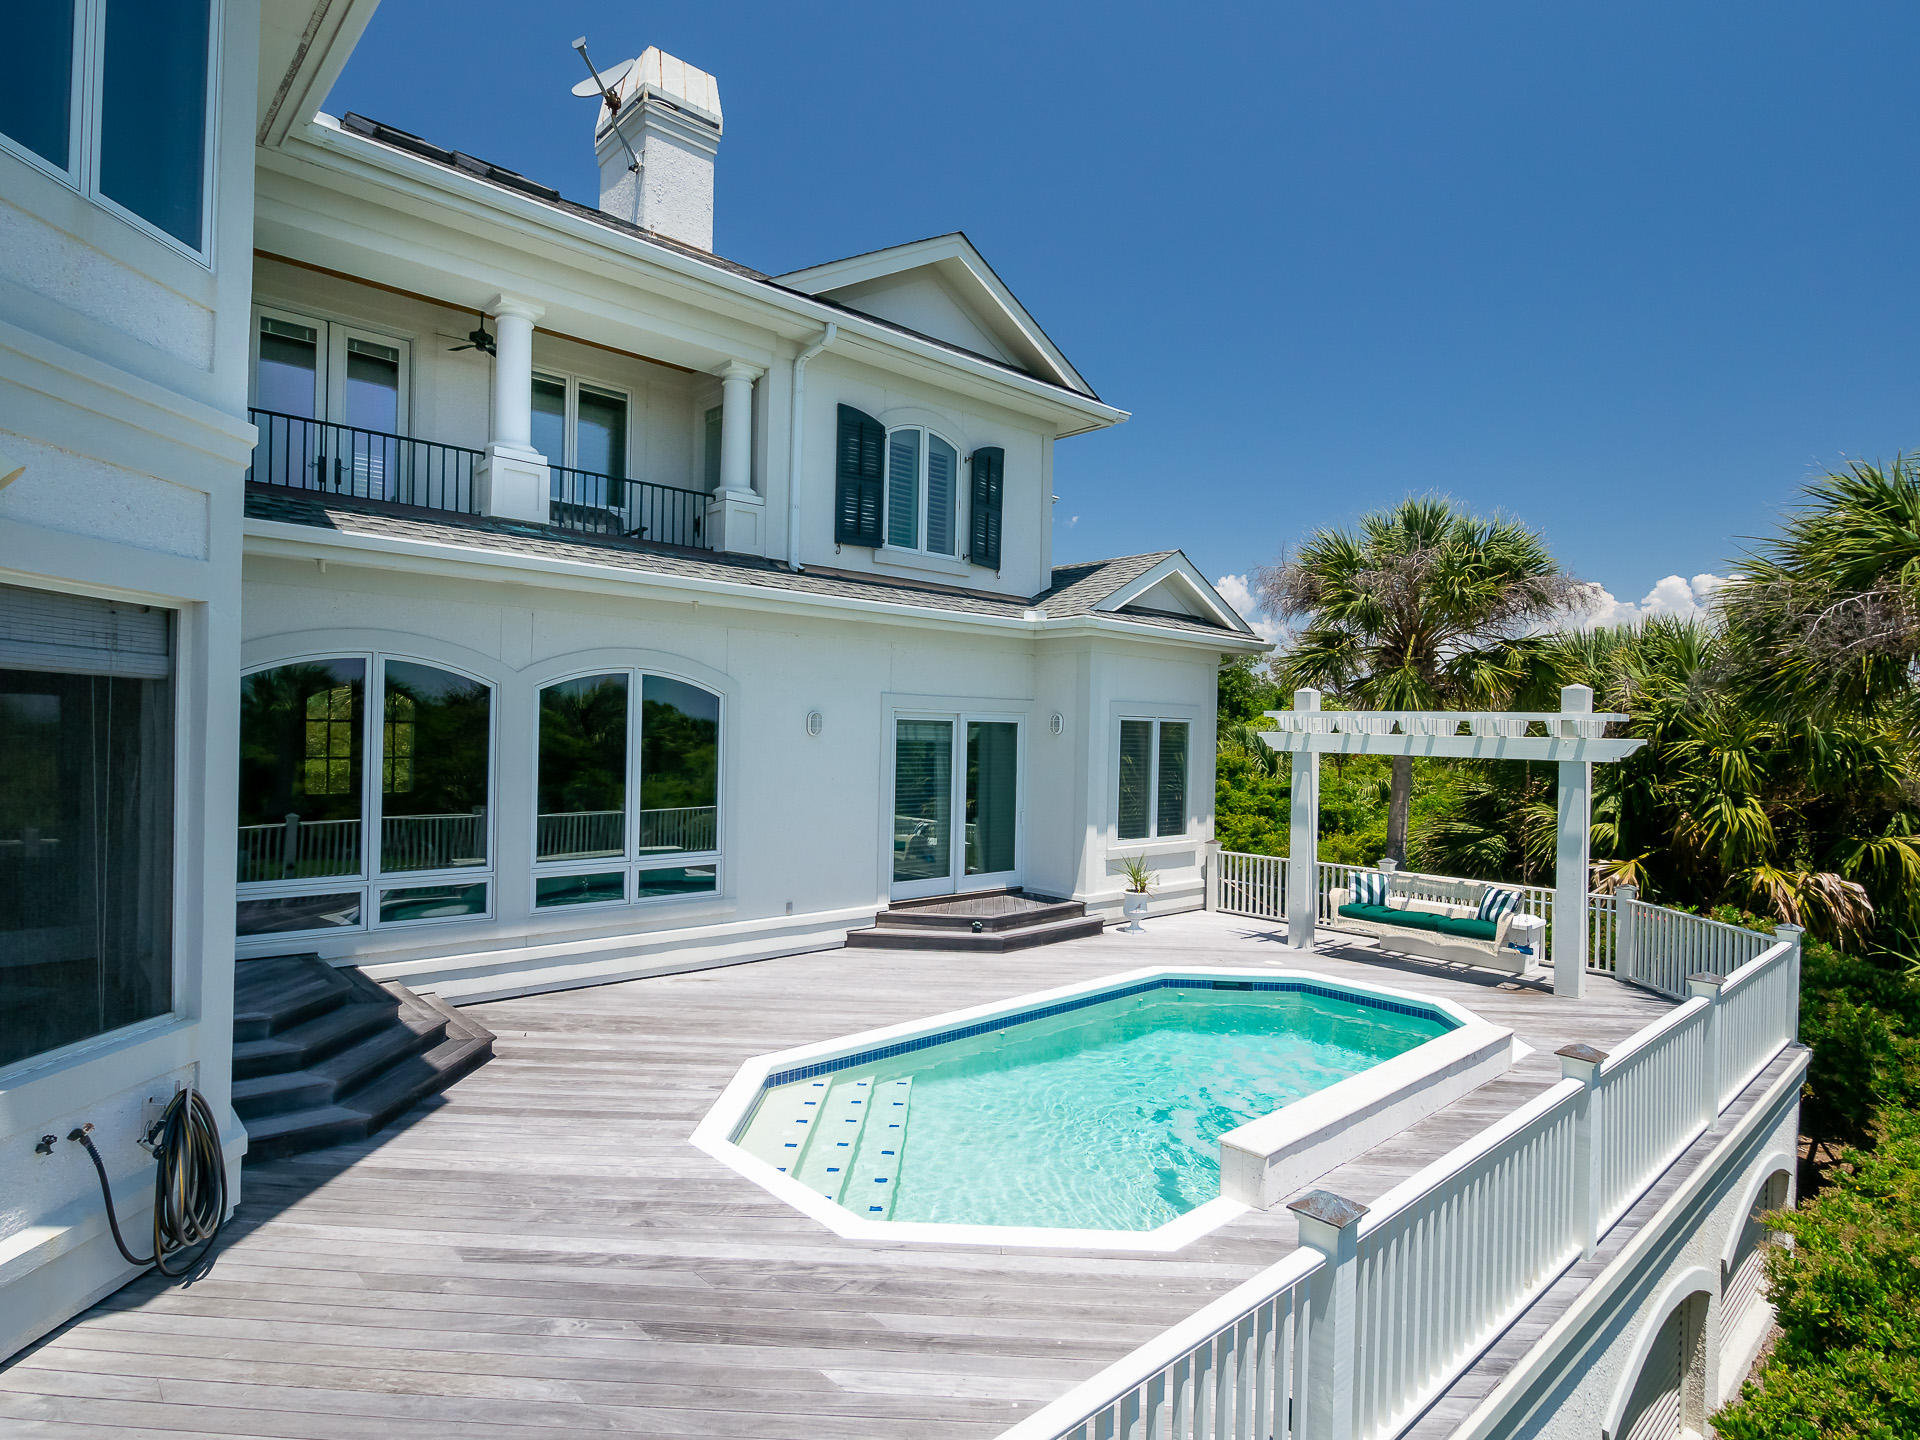 Seabrook Island Homes For Sale - 2216 Rolling Dune, Seabrook Island, SC - 55